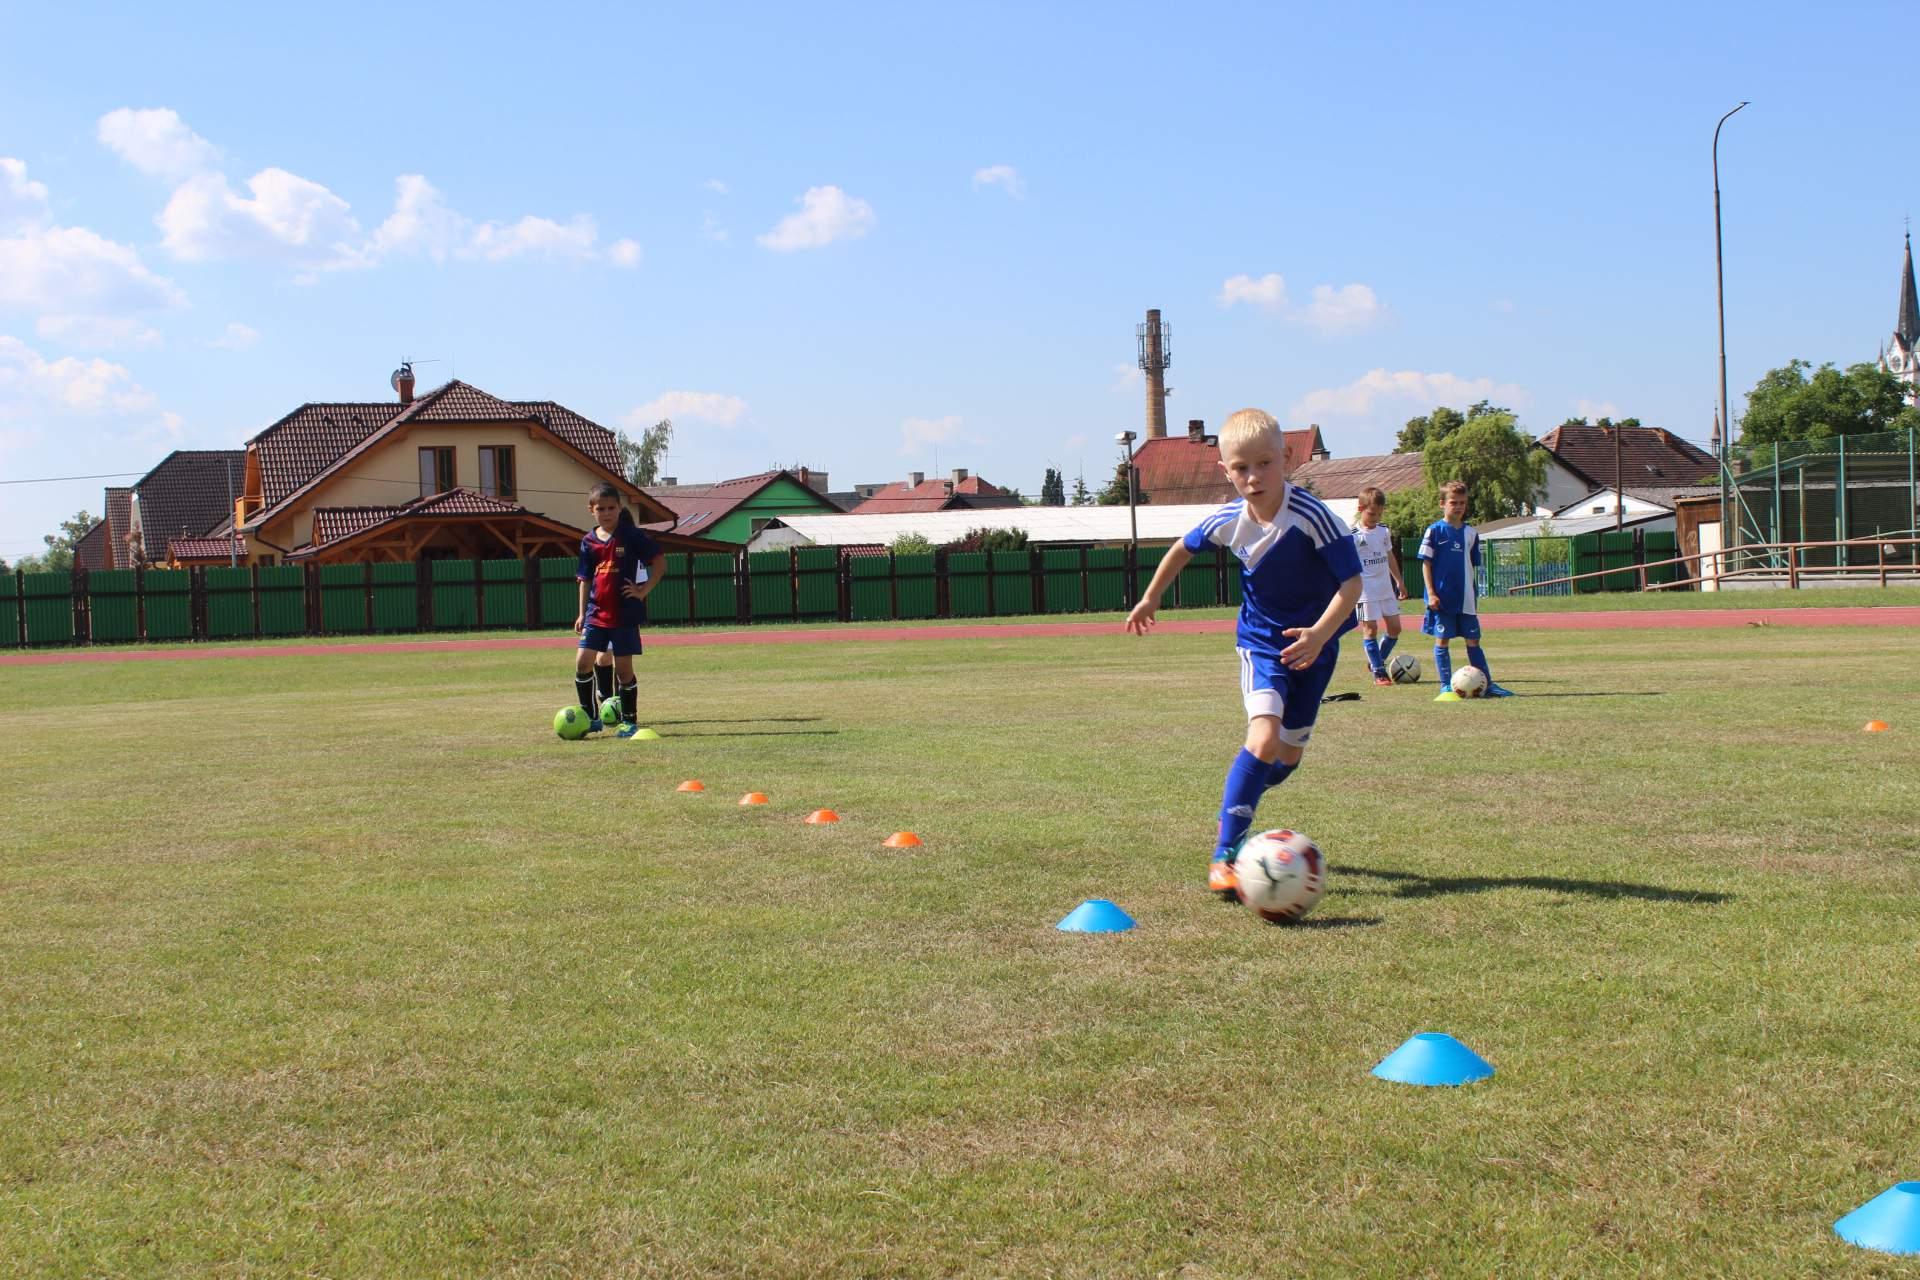 Fotbalové prázdniny Fotbalový kemp Fotbalové Prázdniny 2015